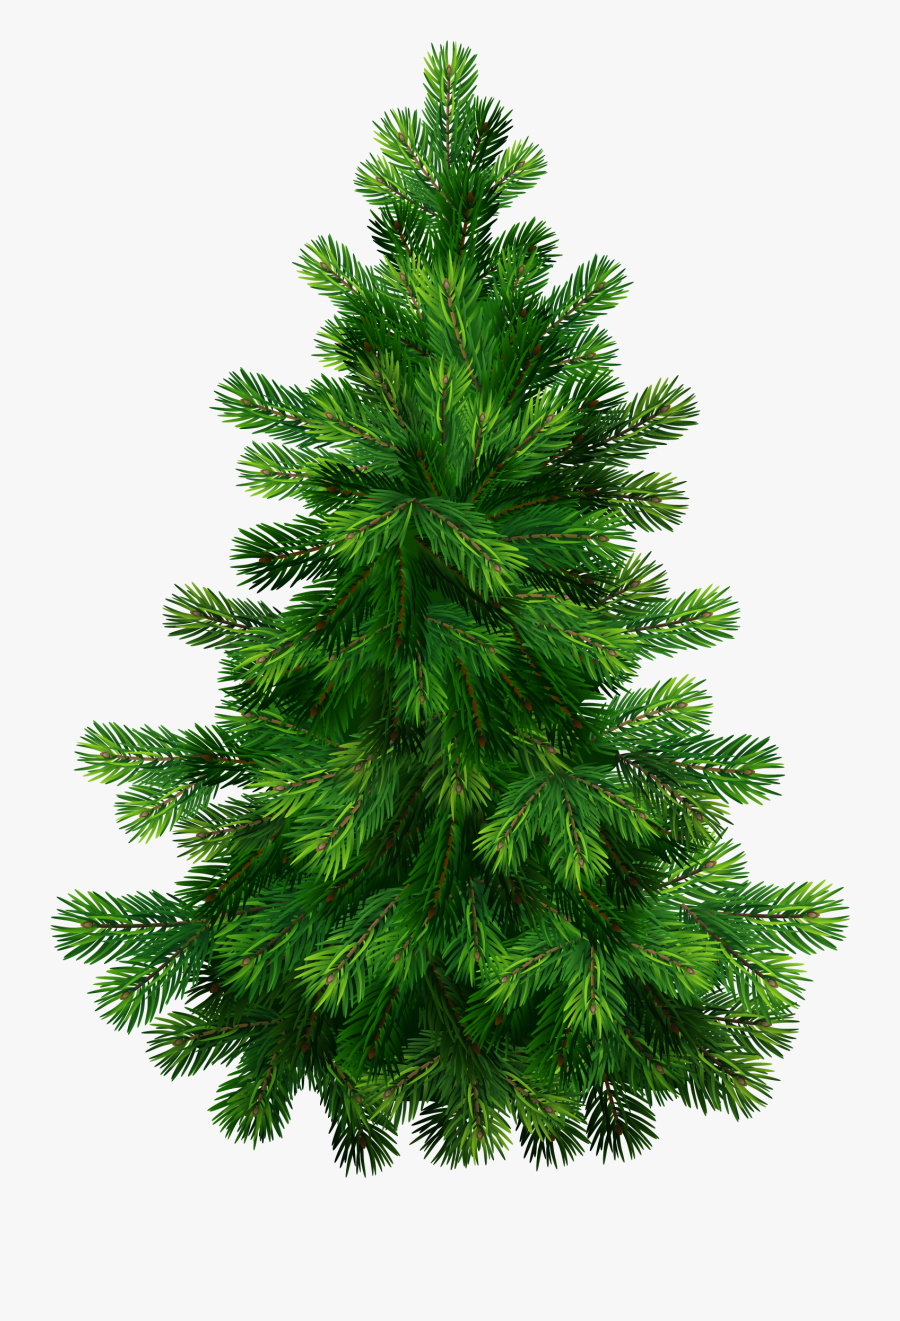 Pine Tree Clipart Png - Pine Tree Transparent Background, Transparent Clipart